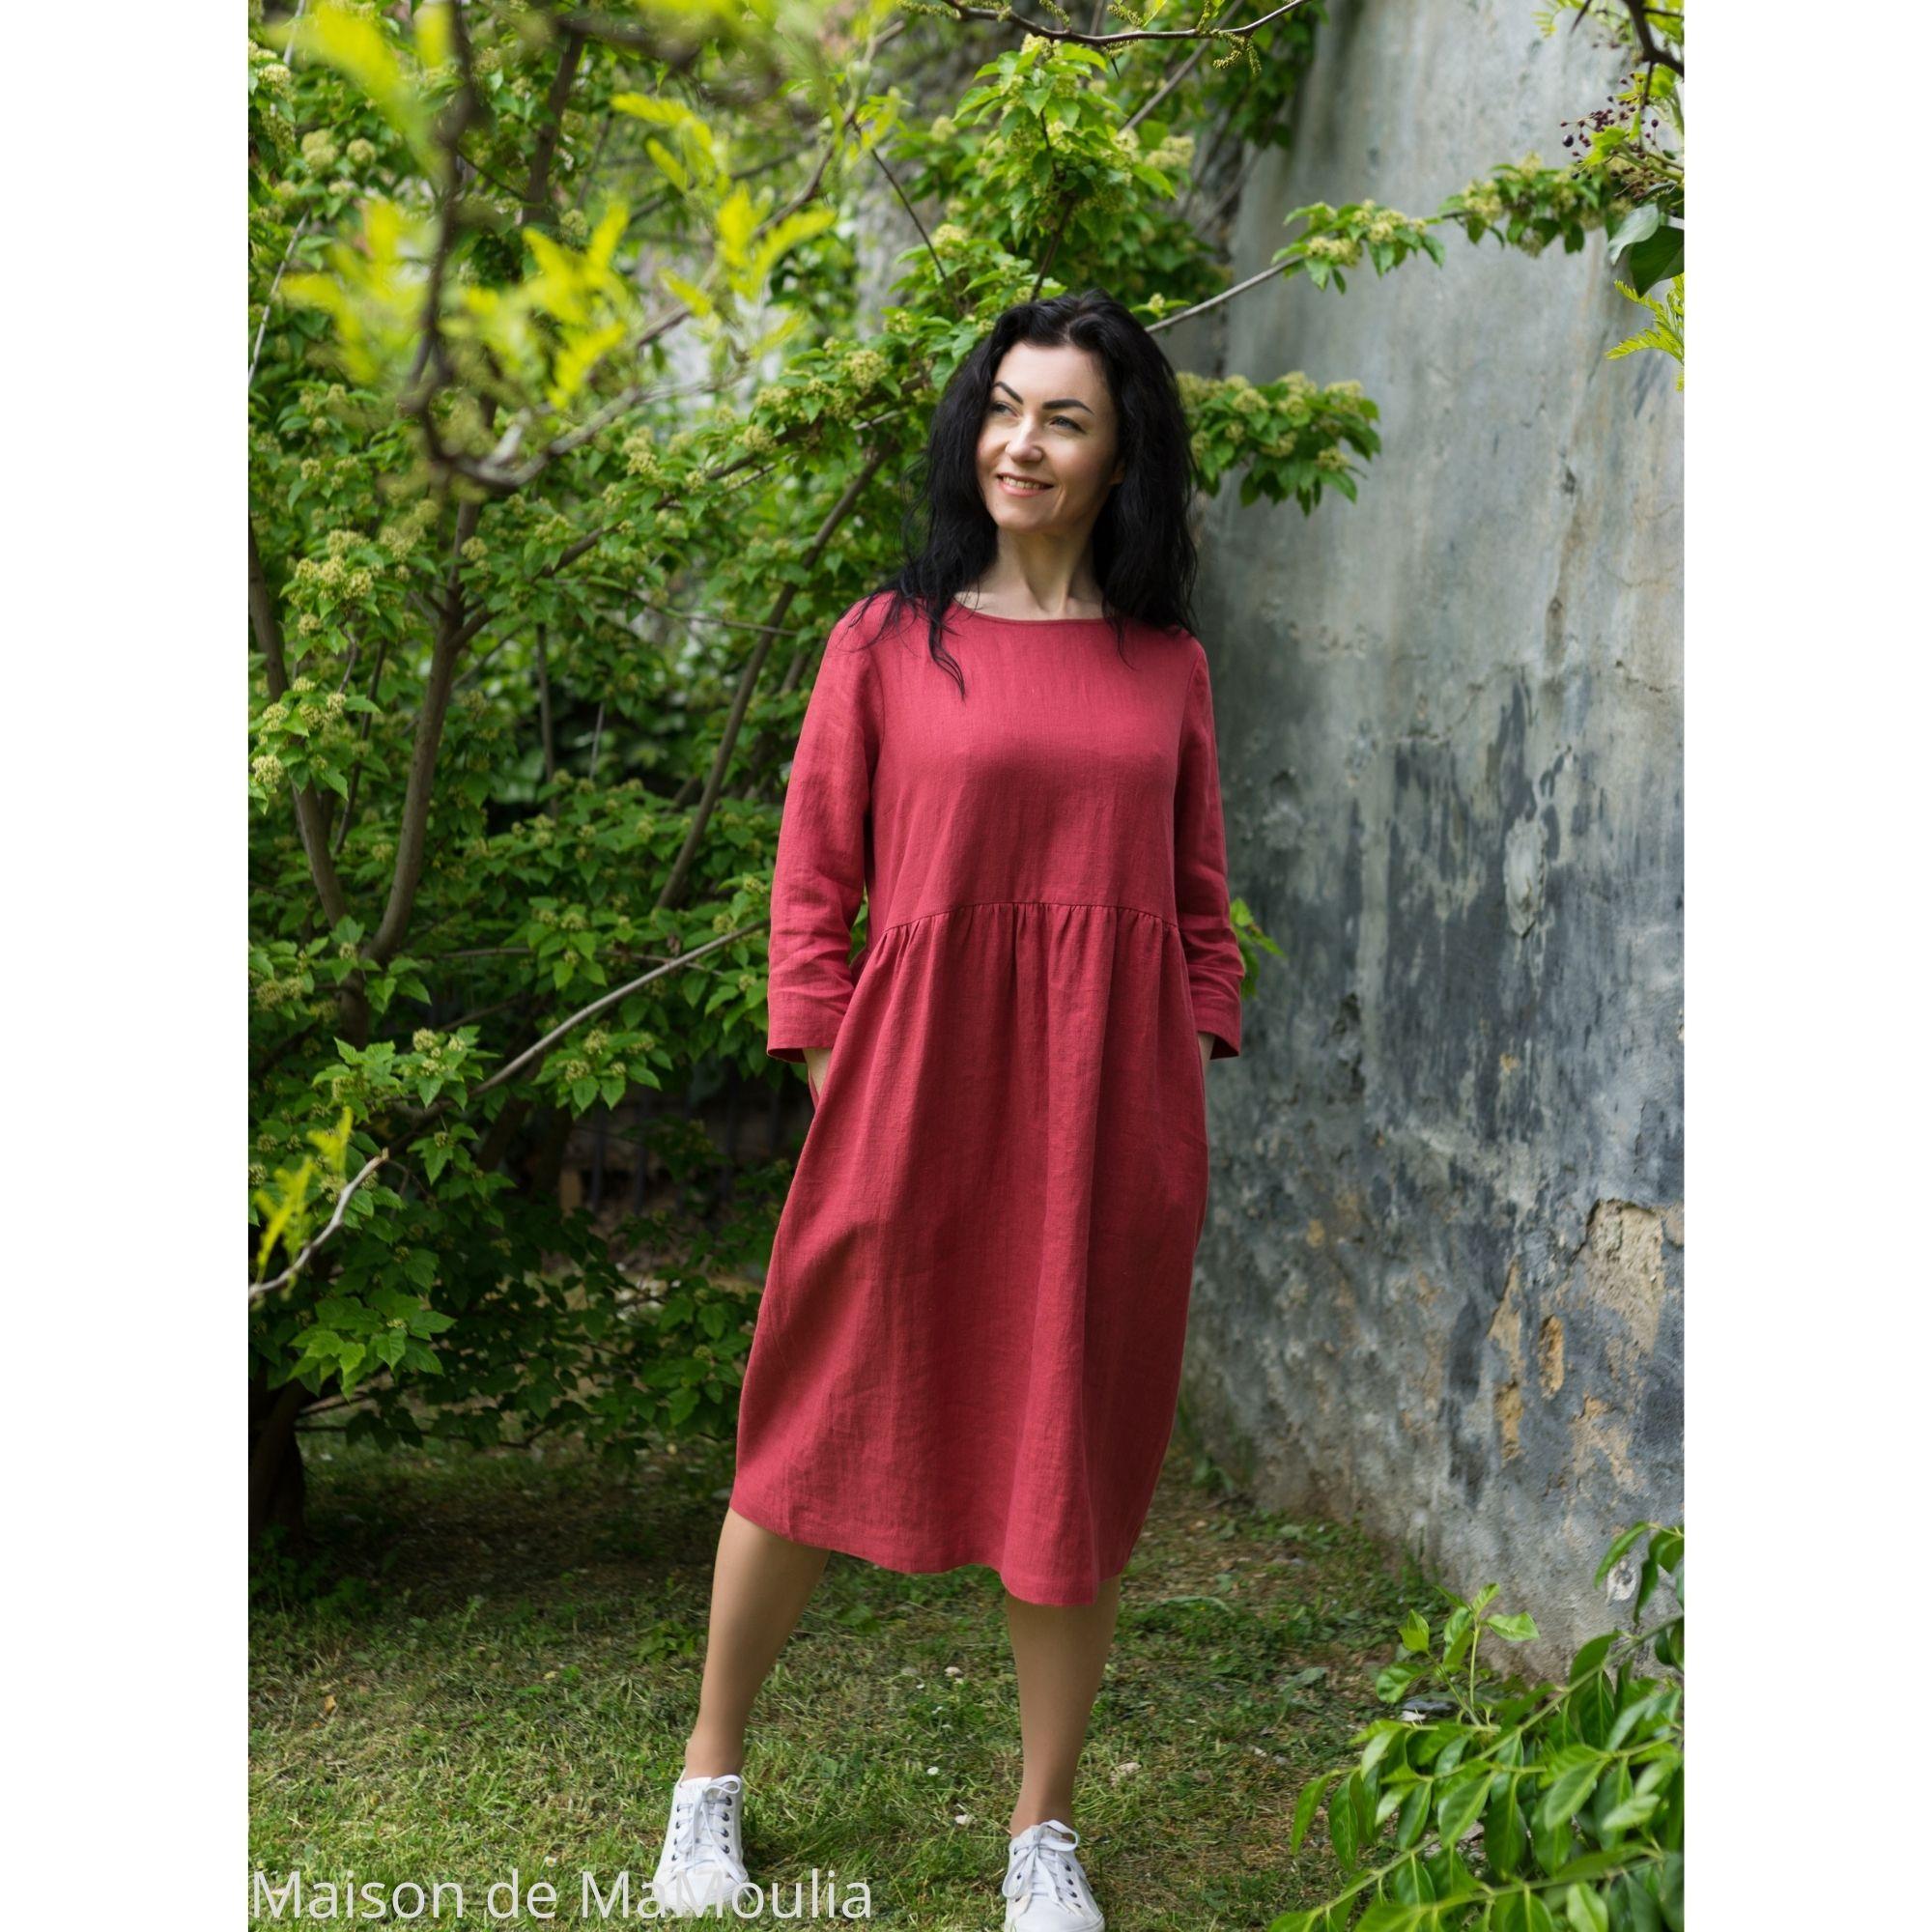 OFFON - Robe ample midi - 100% lin lavé - Rose framboise